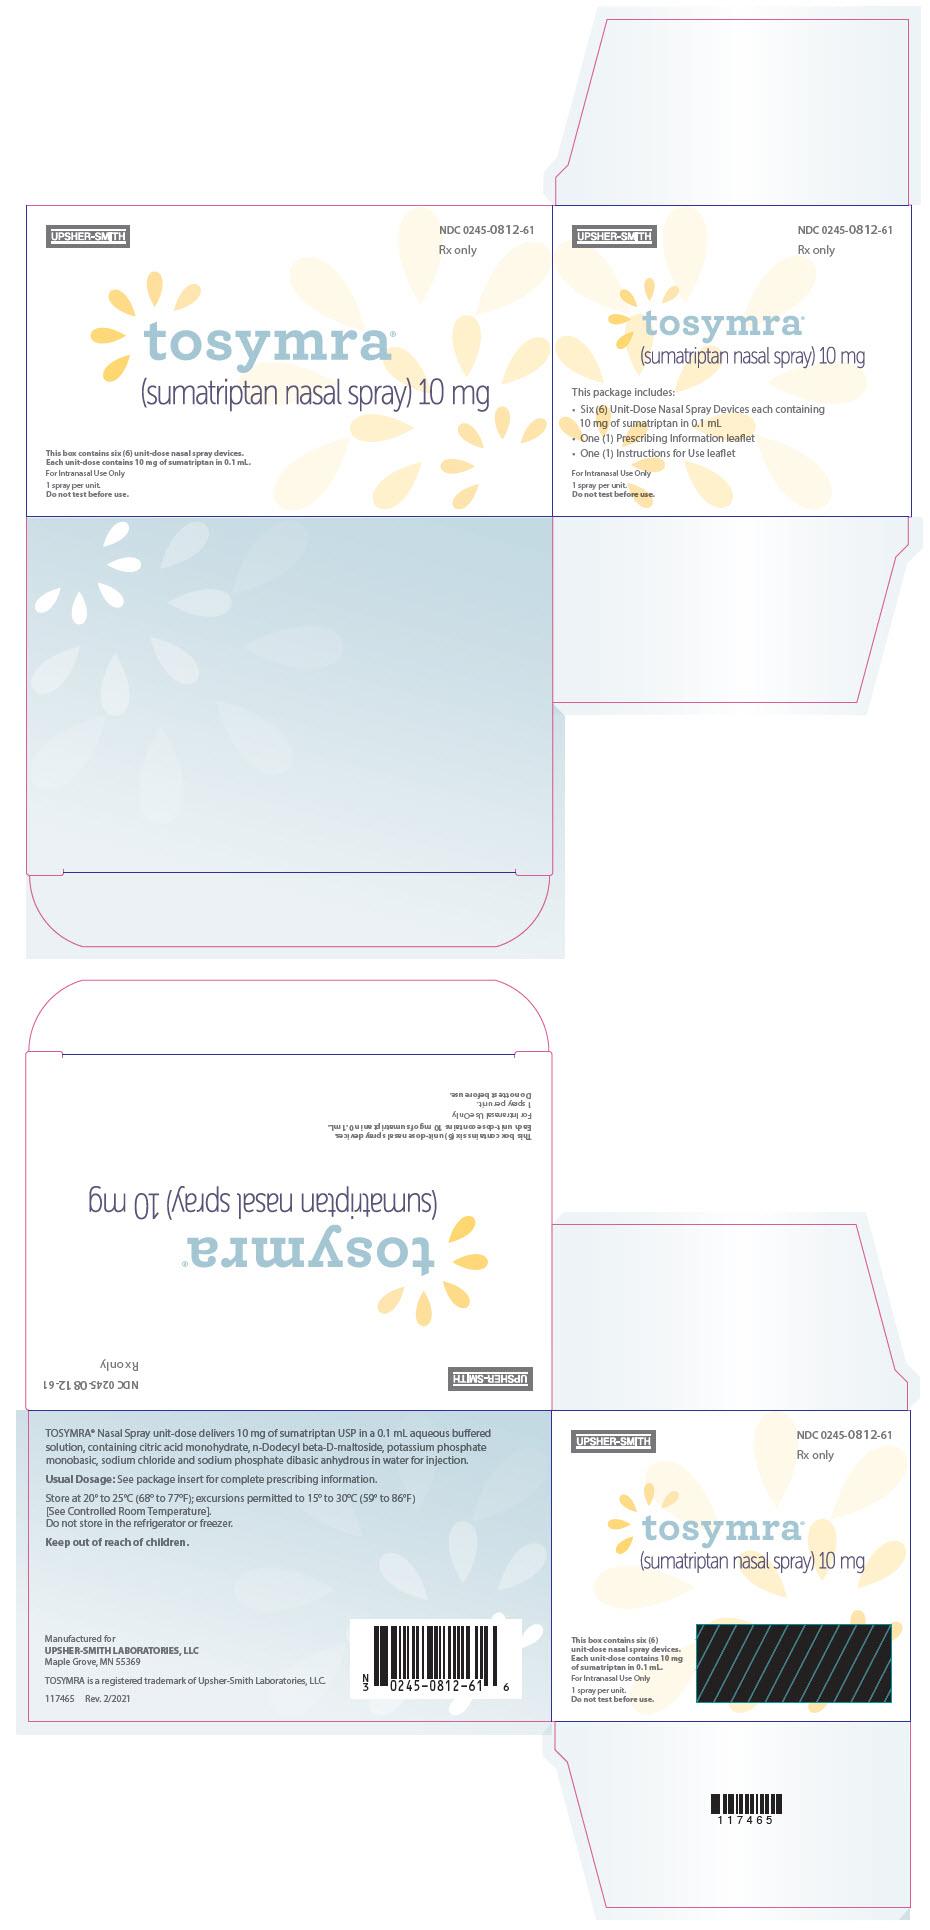 PRINCIPAL DISPLAY PANEL - 6 Bottle Blister Pack Carton